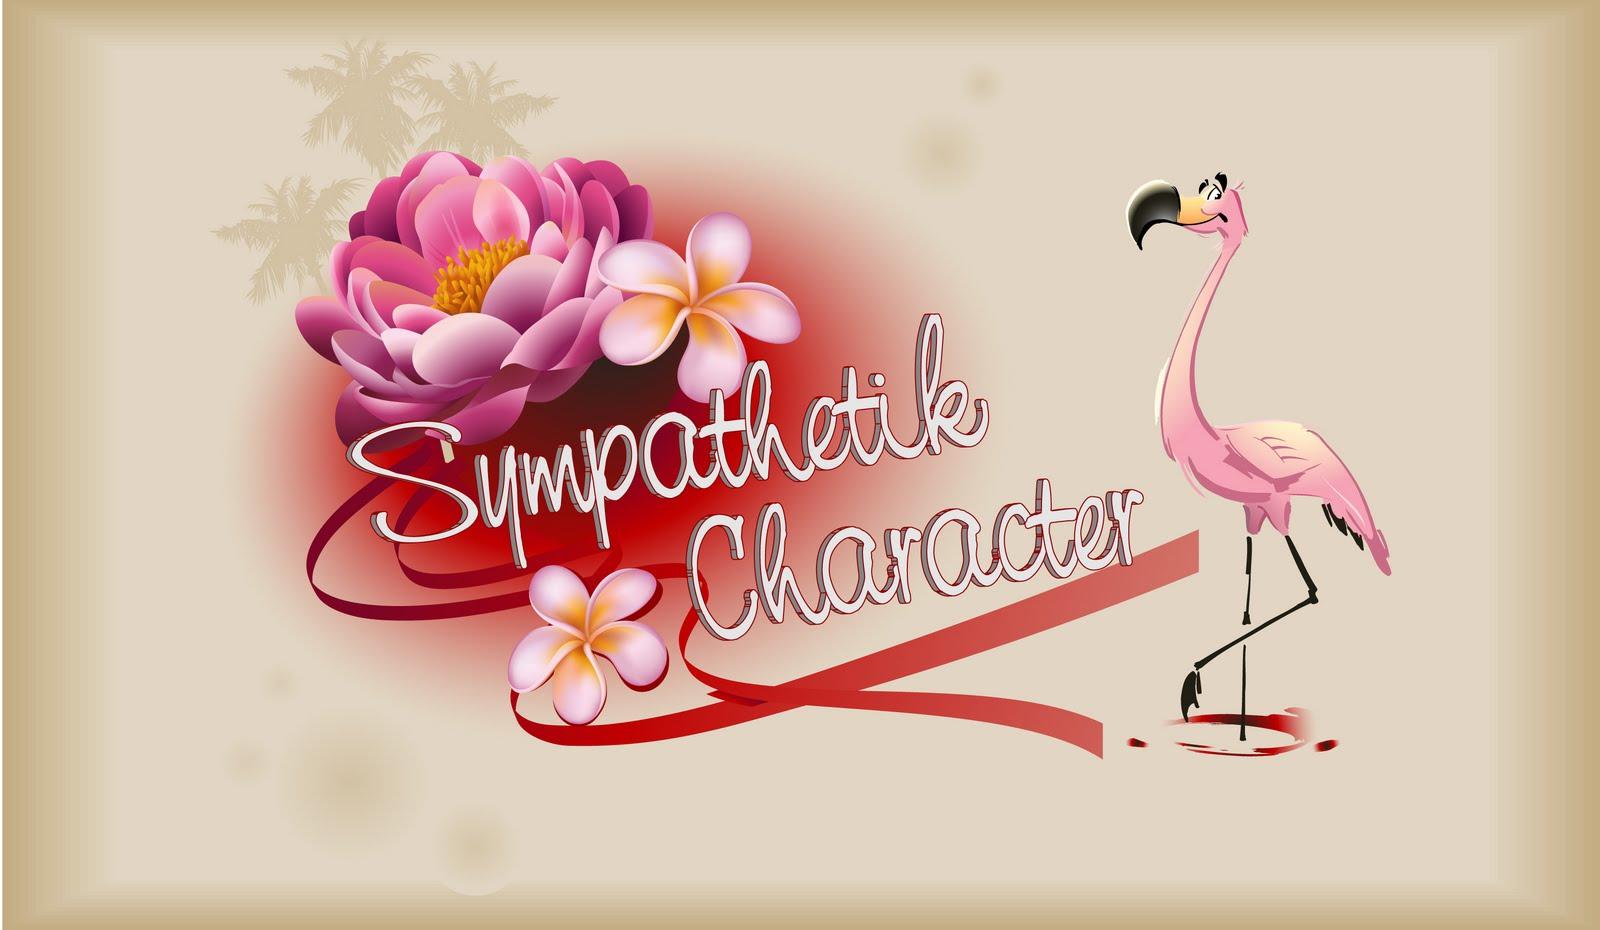 sympathetik character